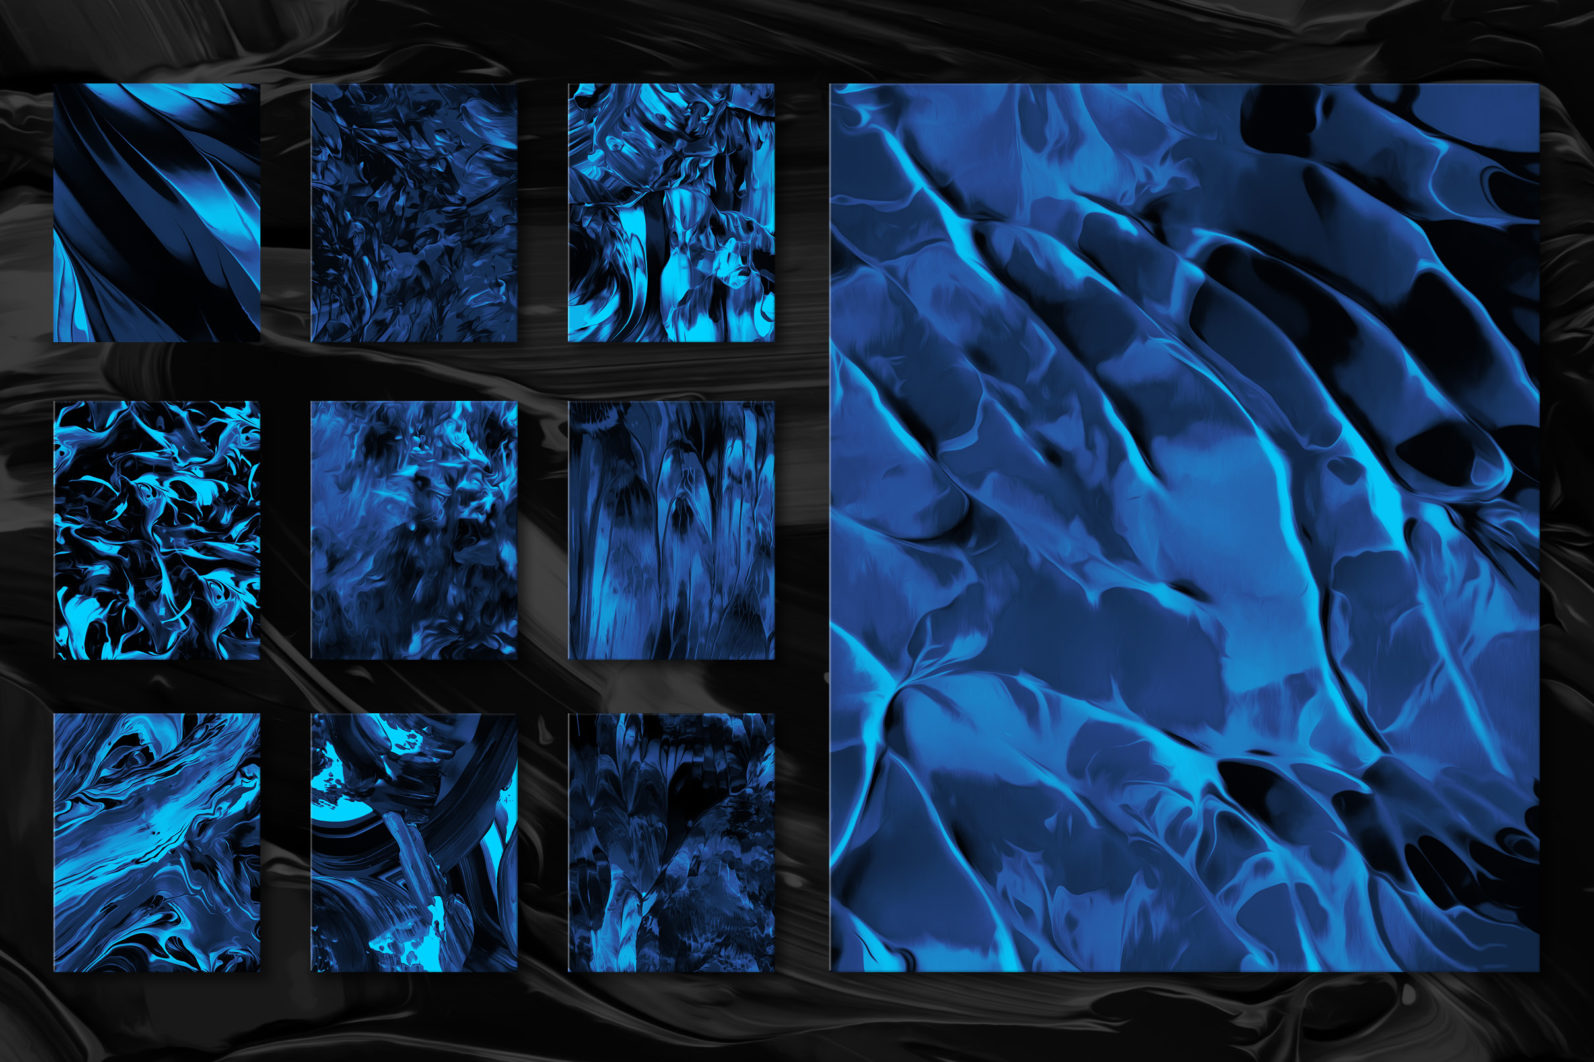 Flow, Vol. 2: 100 Smooth Paint Textures - Flow Vol 2 Preview 11 -